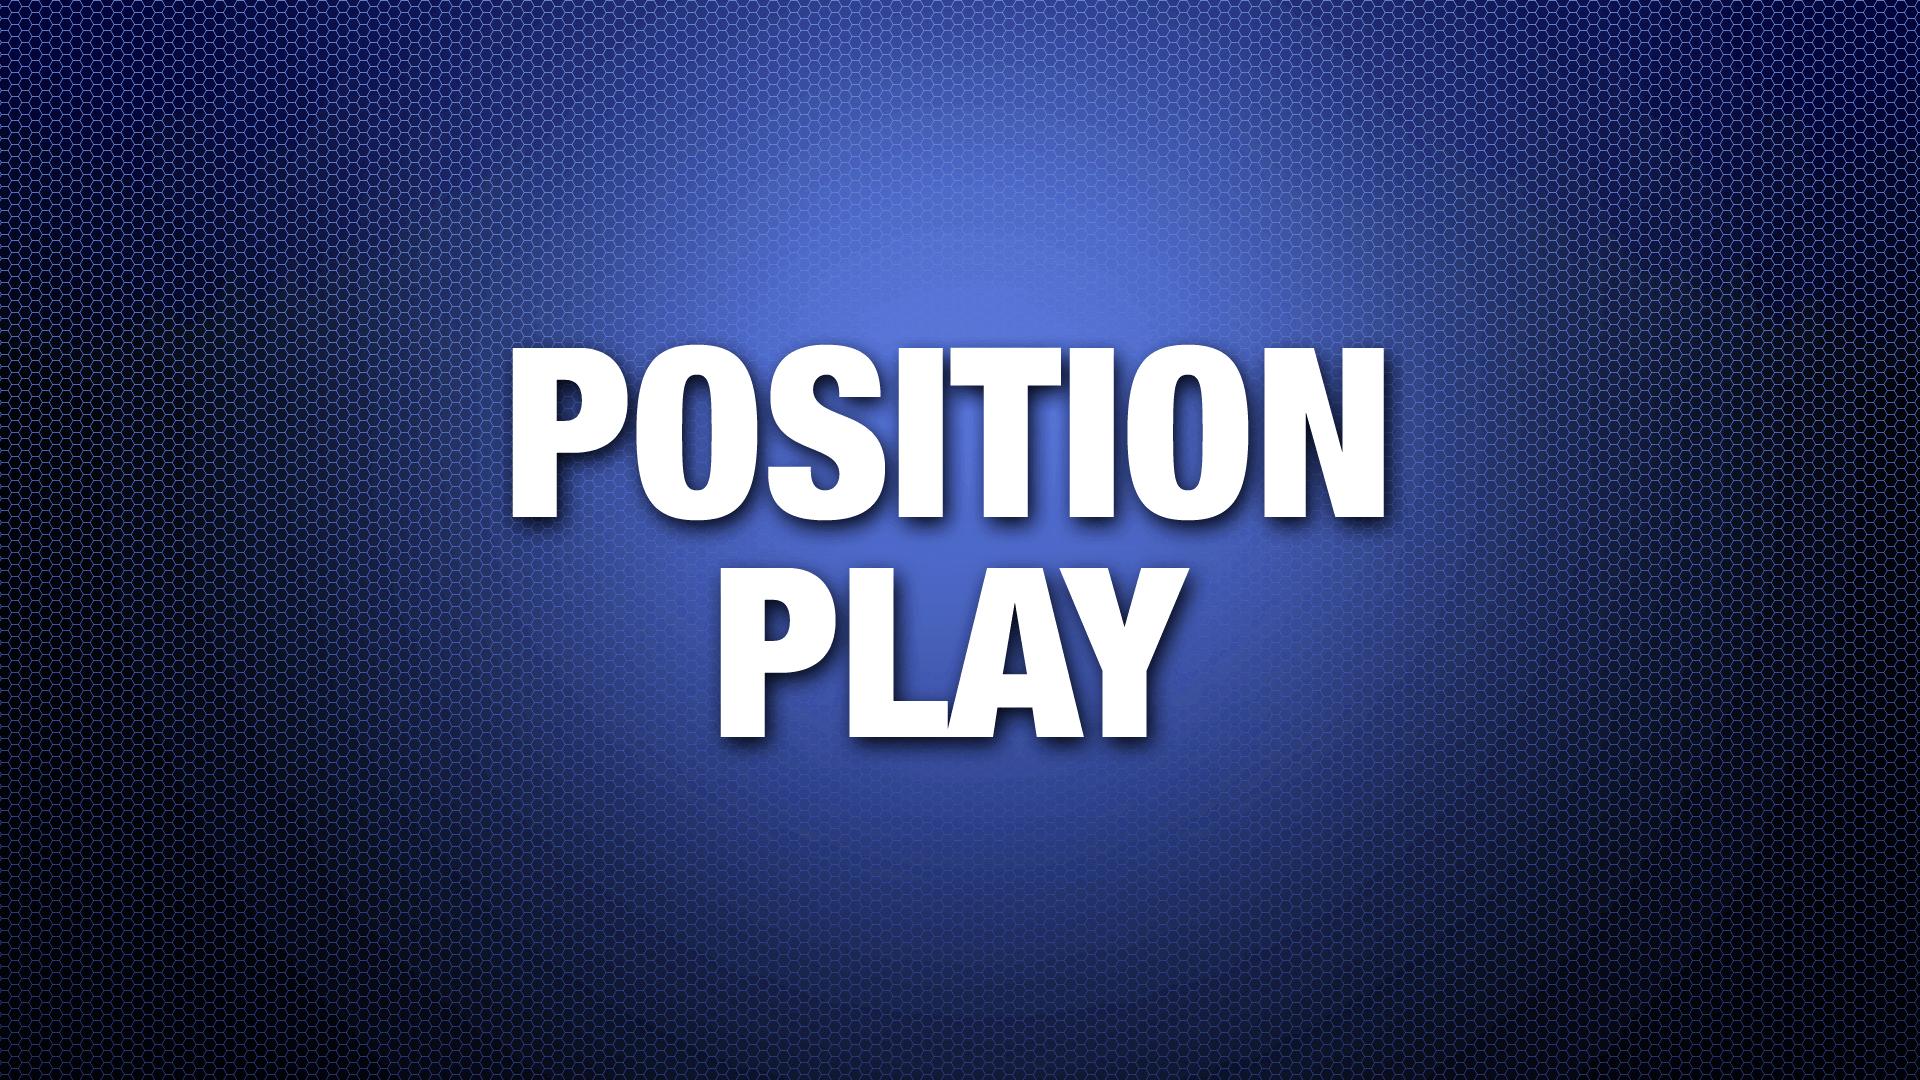 PositionPlay